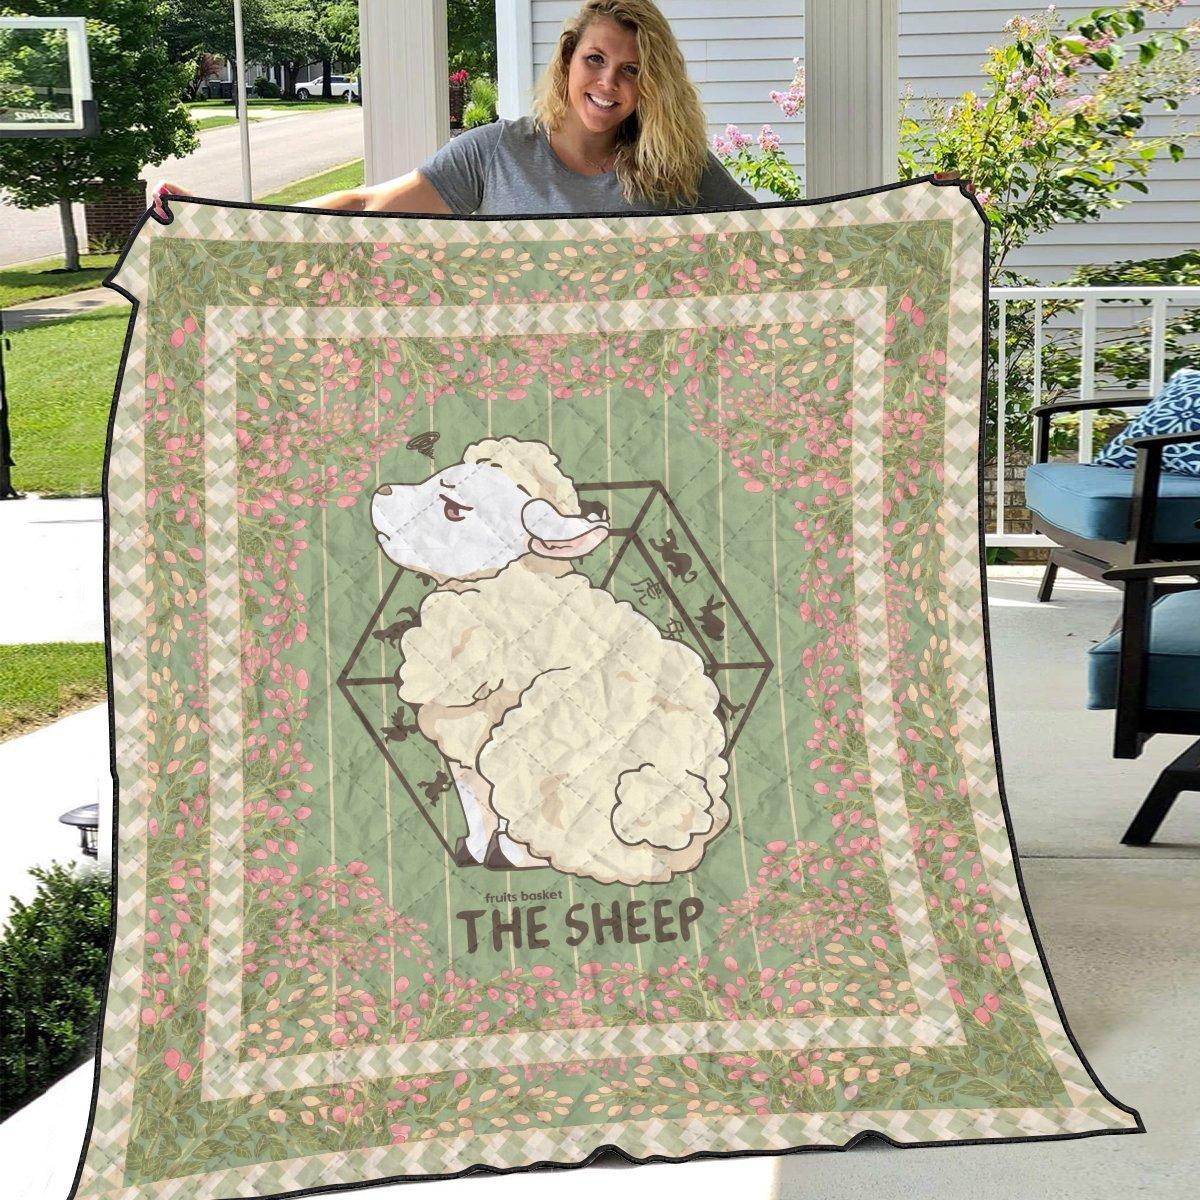 hiro the sheep quilt blanket 631077 - Otaku Treat